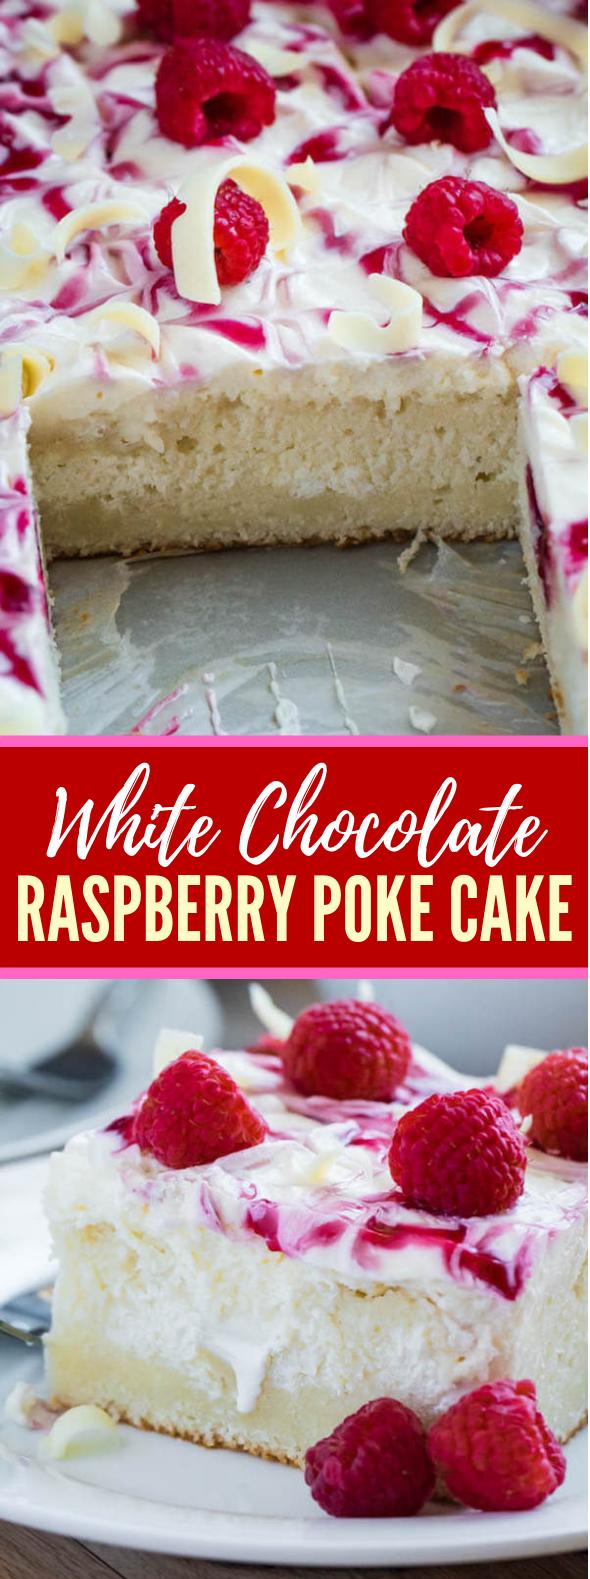 WHITE CHOCOLATE RASPBERRY POKE CAKE #desserts #berries